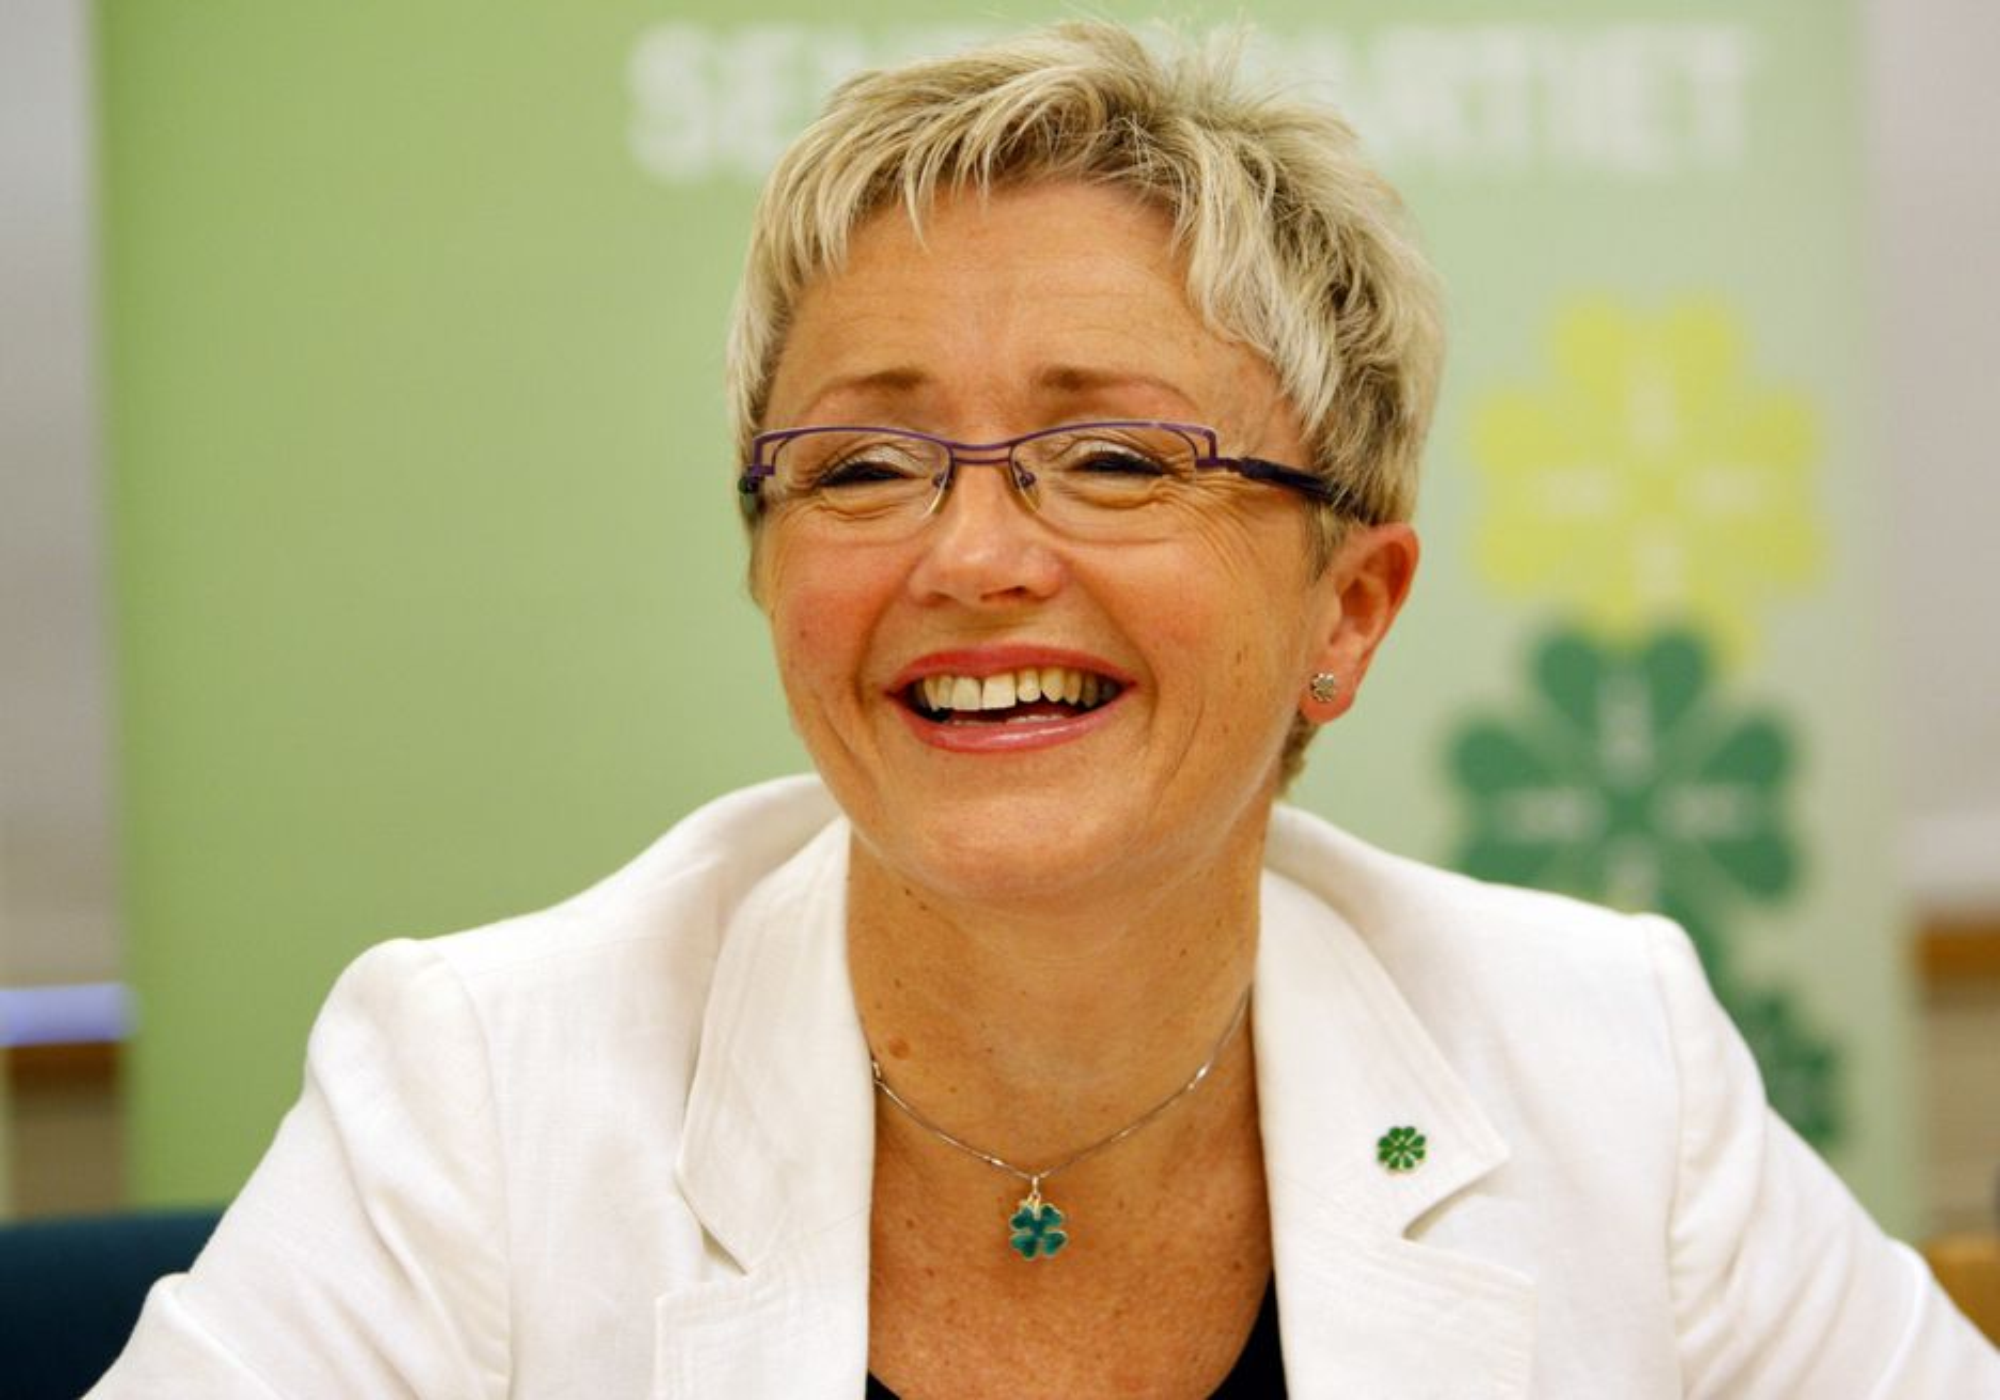 Partileder Liv Signe Navarsete snakker på pressetreffet i Oslo tirsdag om Senterpartiets landsmøte senere i uken.